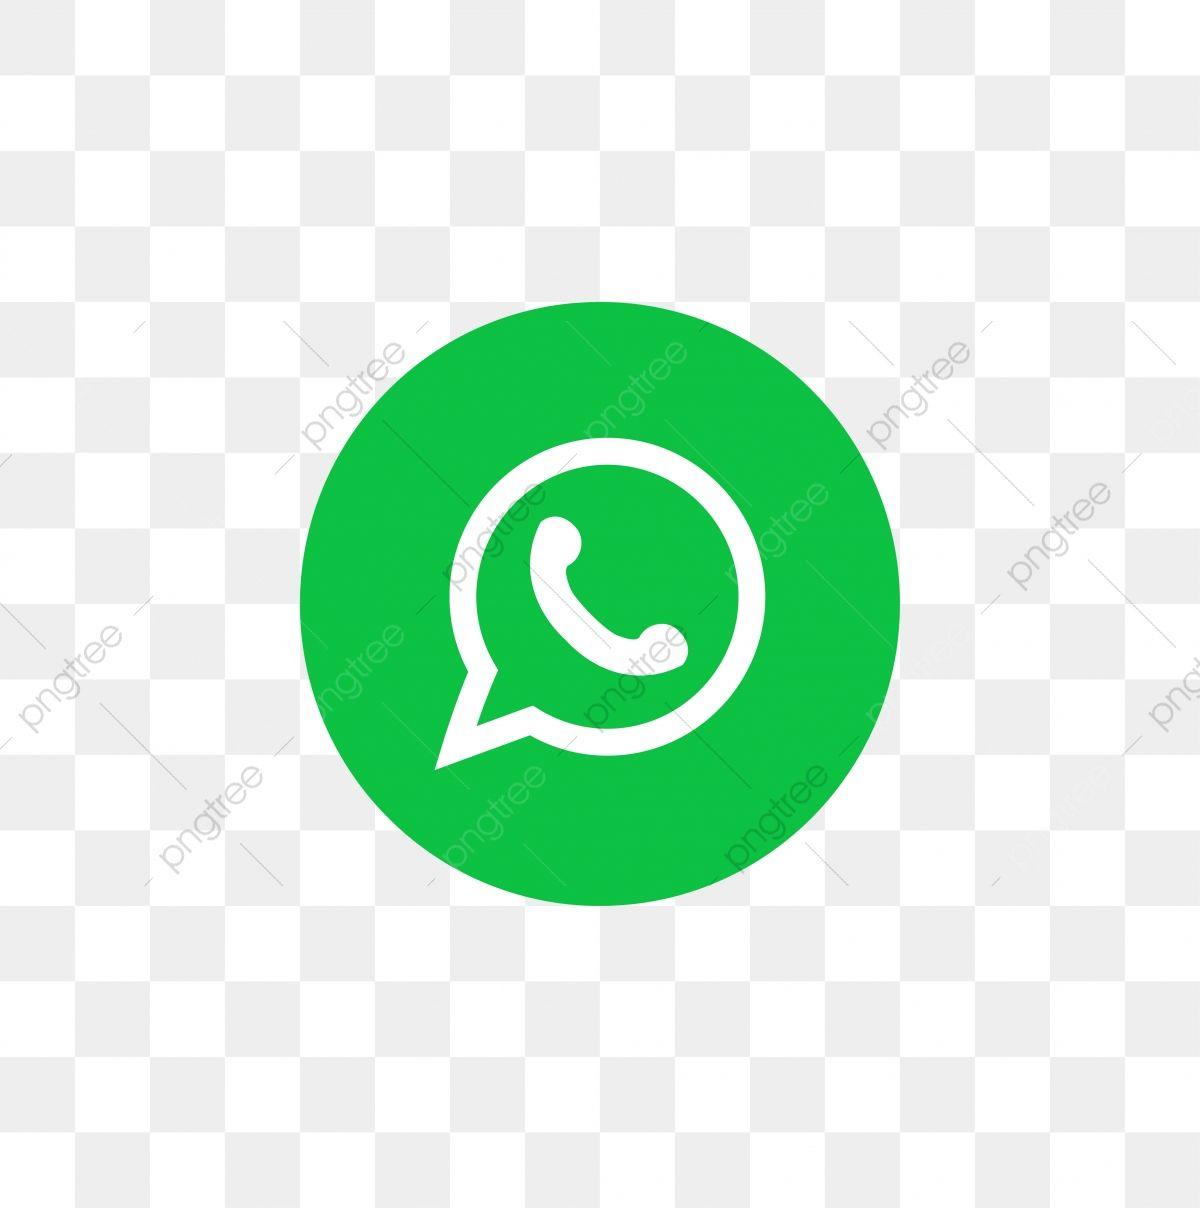 Whatsapp وسائل الإعلام الاجتماعية أيقونة تصميم قالب ناقلات Whatsapp الشعار شعار قصاصات فنية Whatsapp من الرموز الرموز الاجتماعية Png والمتجهات للتحميل مجانا Simbolo Do Whatsapp Icones De Midia Social Simbolo Whatsapp